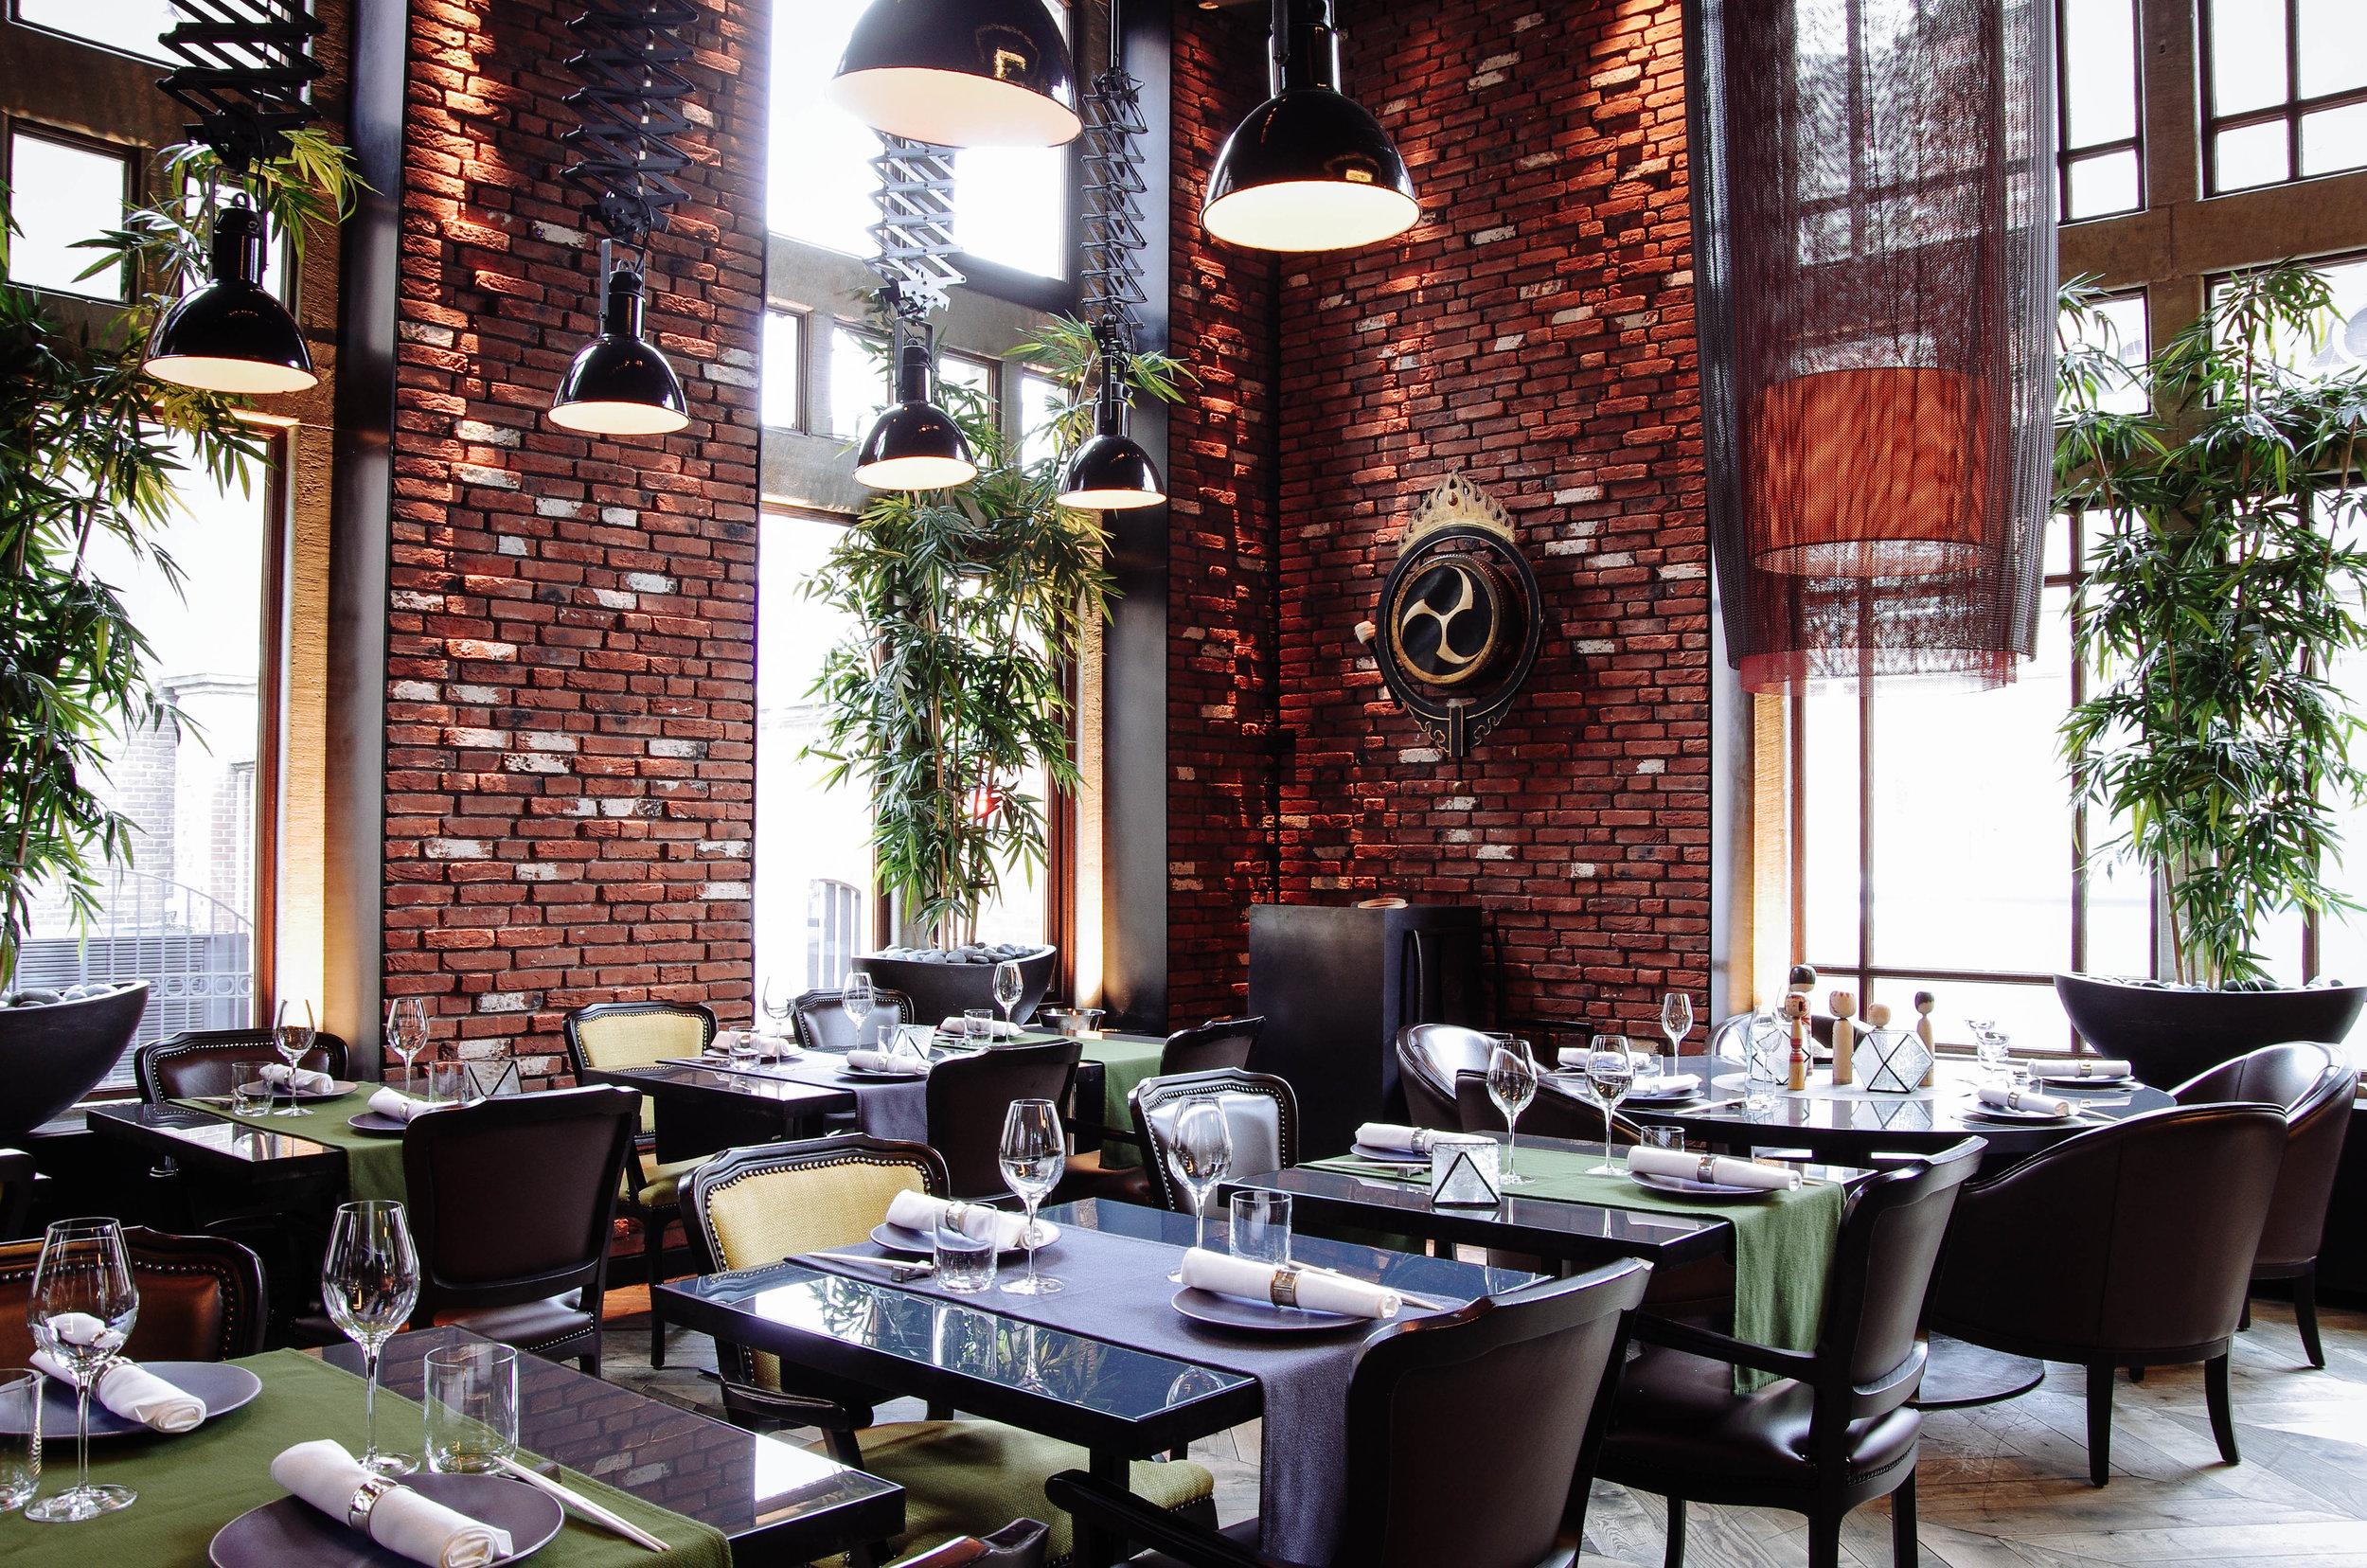 CONSERVATORIUM HOTEL AMSTERDAM - Taiko restaurant 12.jpg